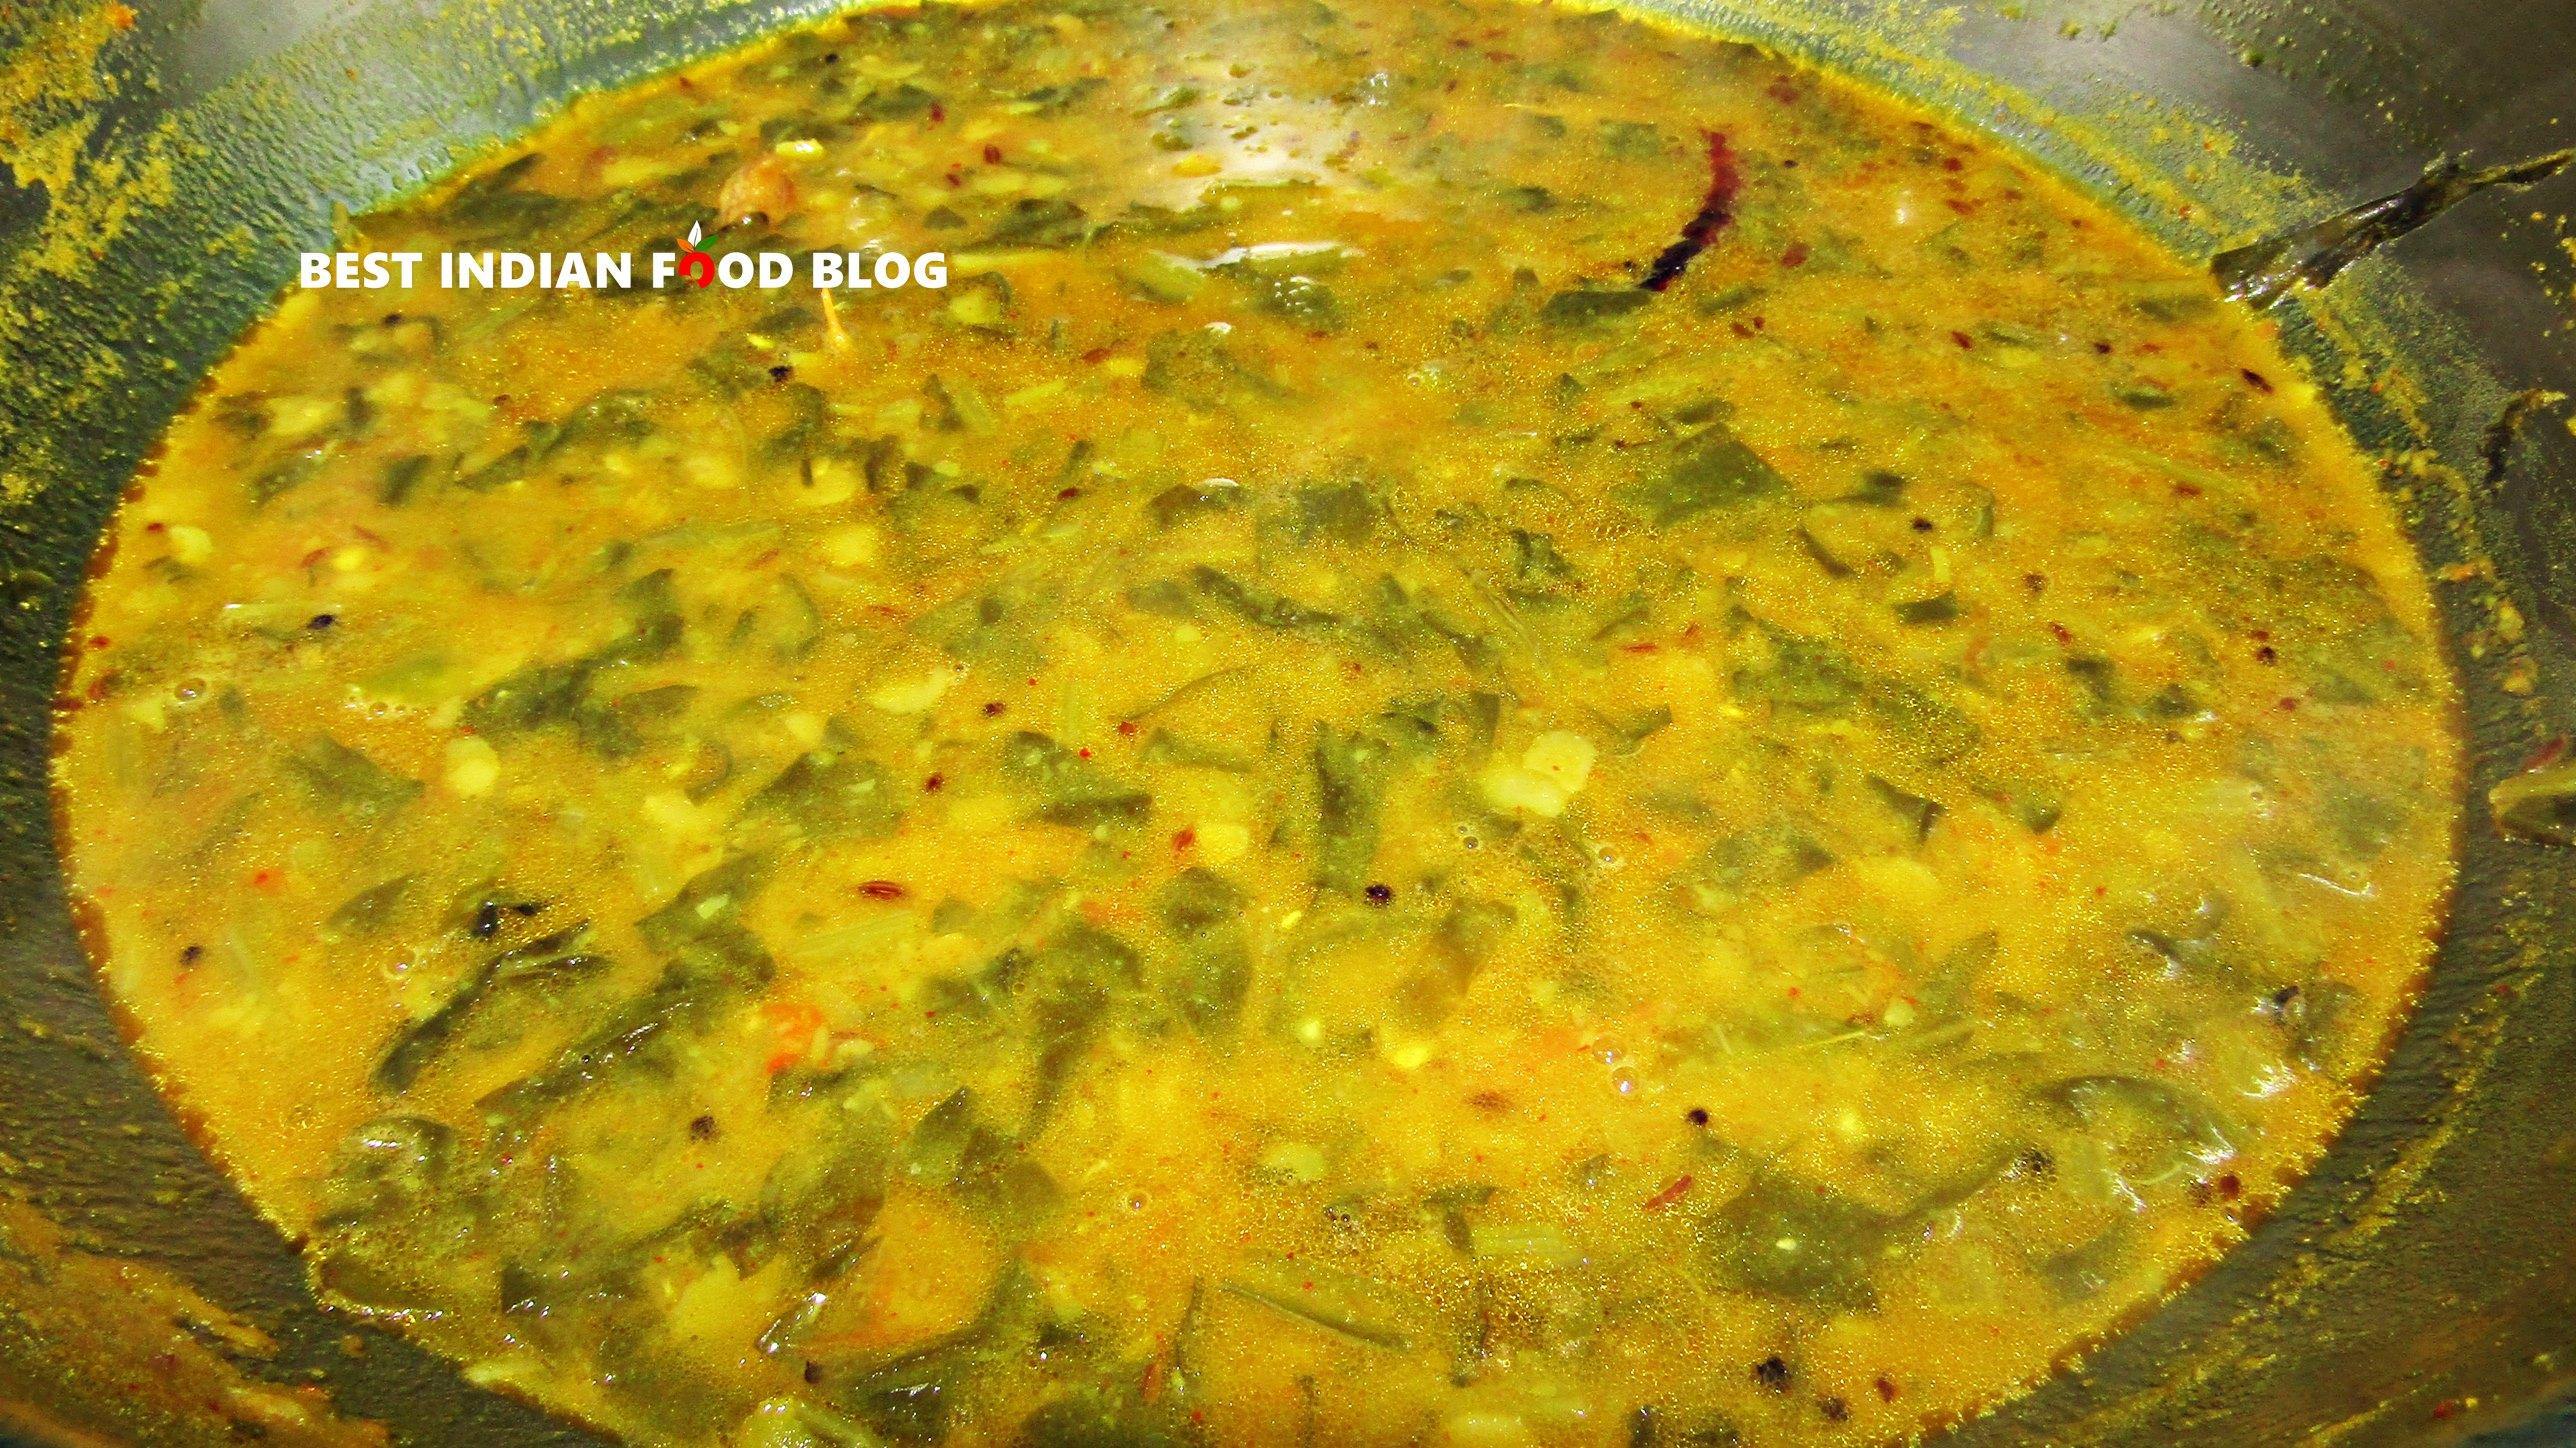 Palakura Pappu from Andhra Pradesh, India | Best Indian Food Blog | Spinach Pigeon Peas recipe